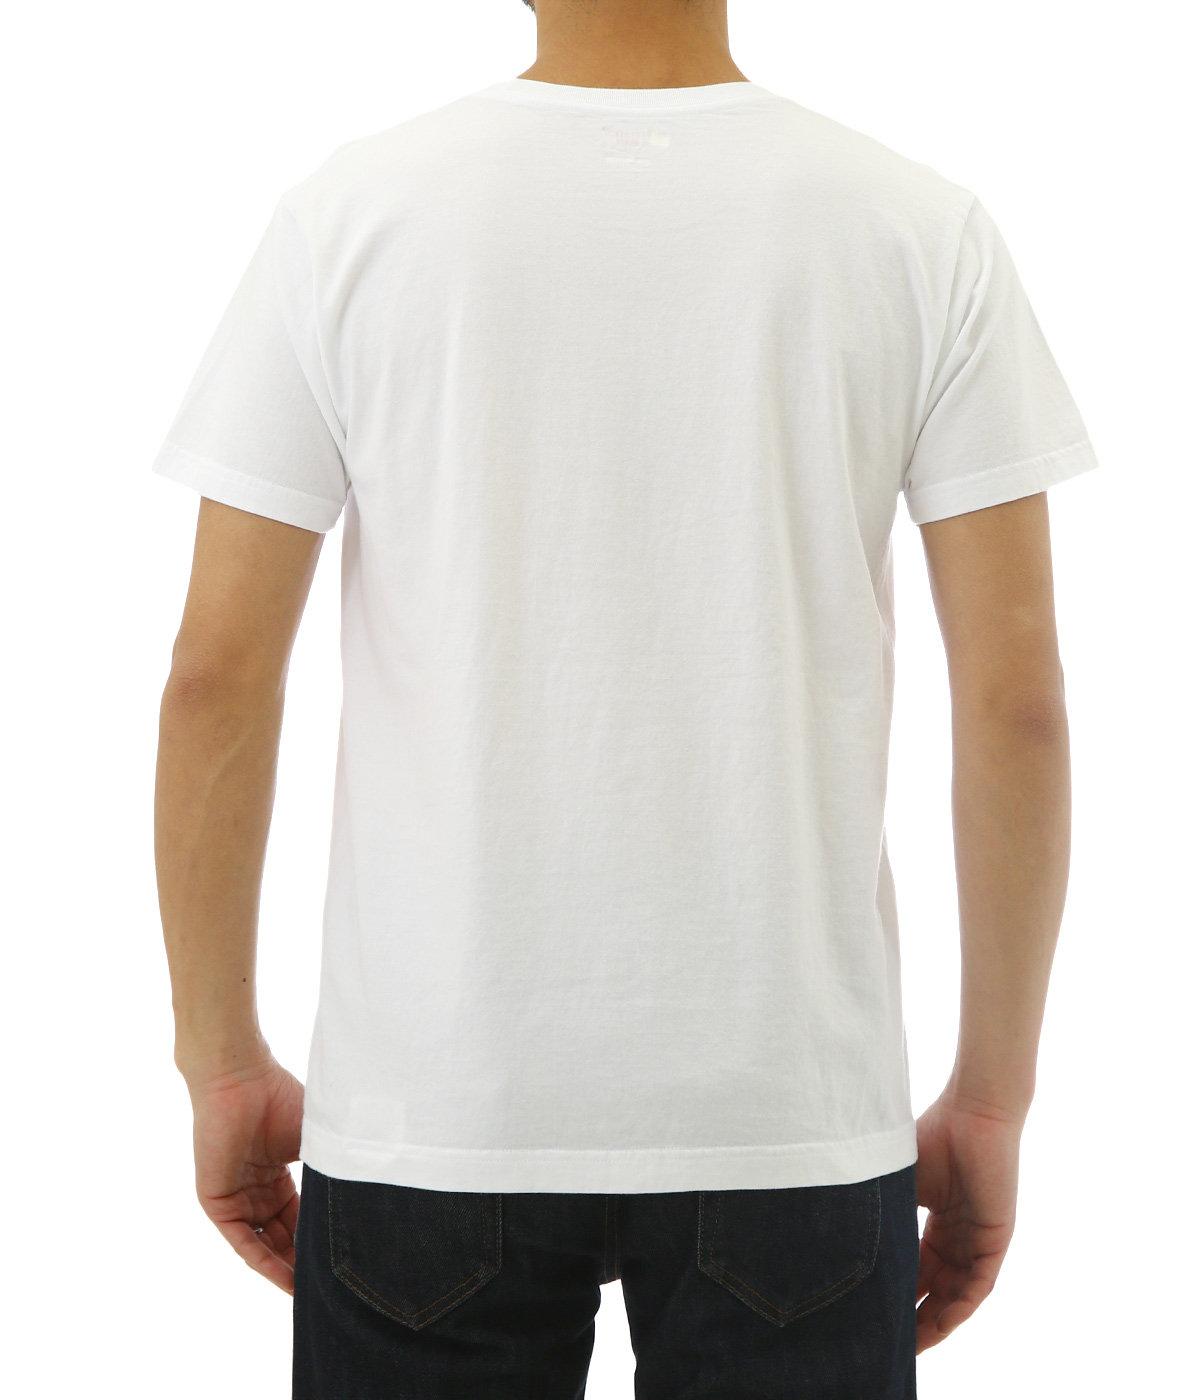 2P Japan Fit クルーネックTシャツ  5.3oz